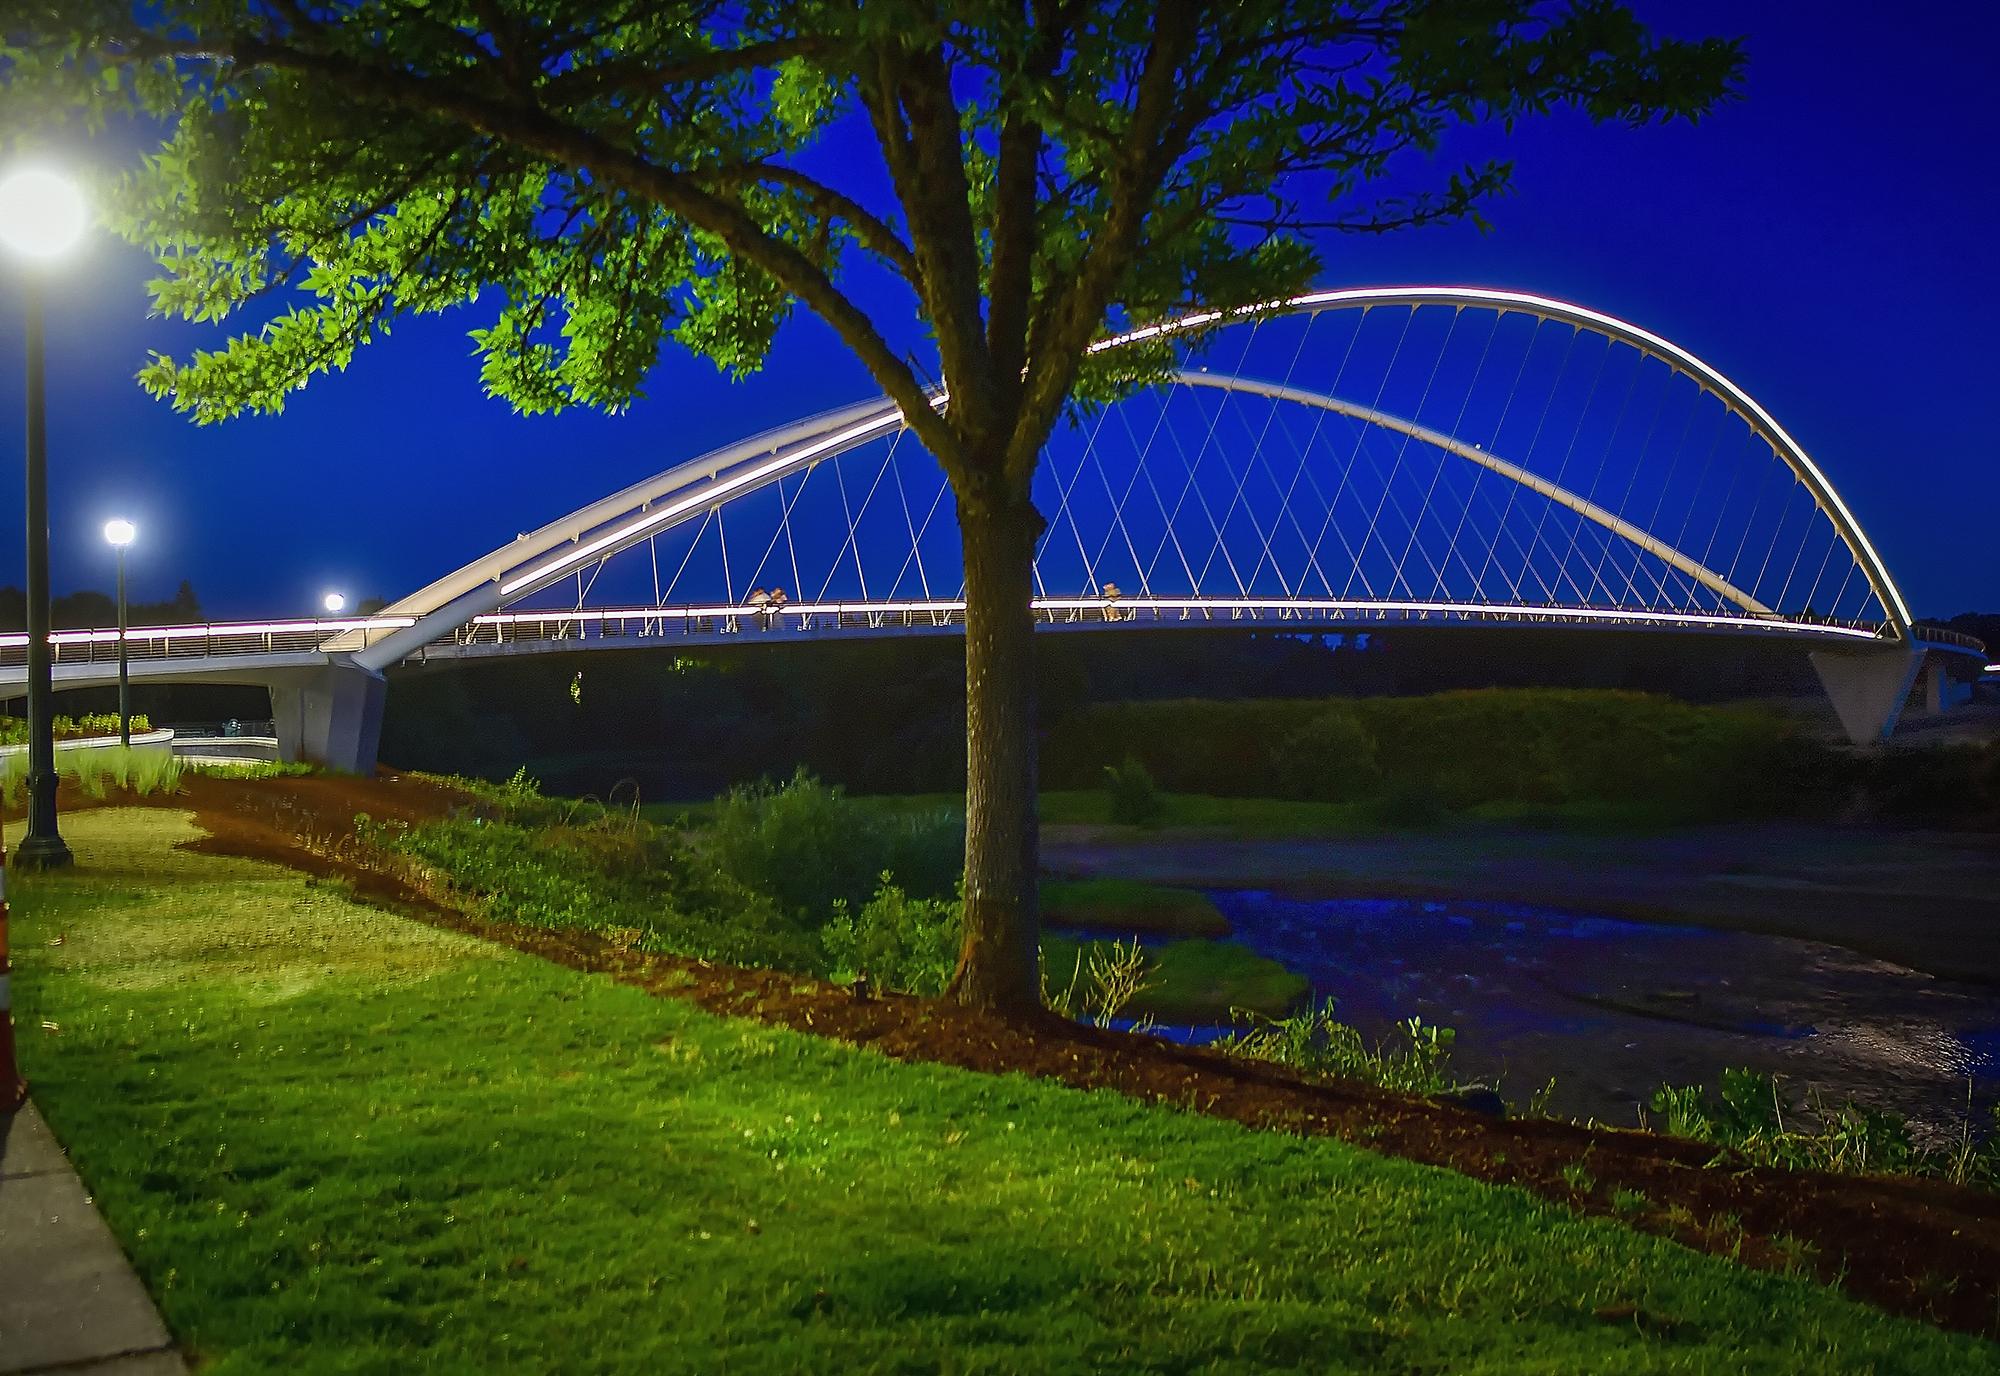 Minto bridge new lights 7-28-17 copy.jpg